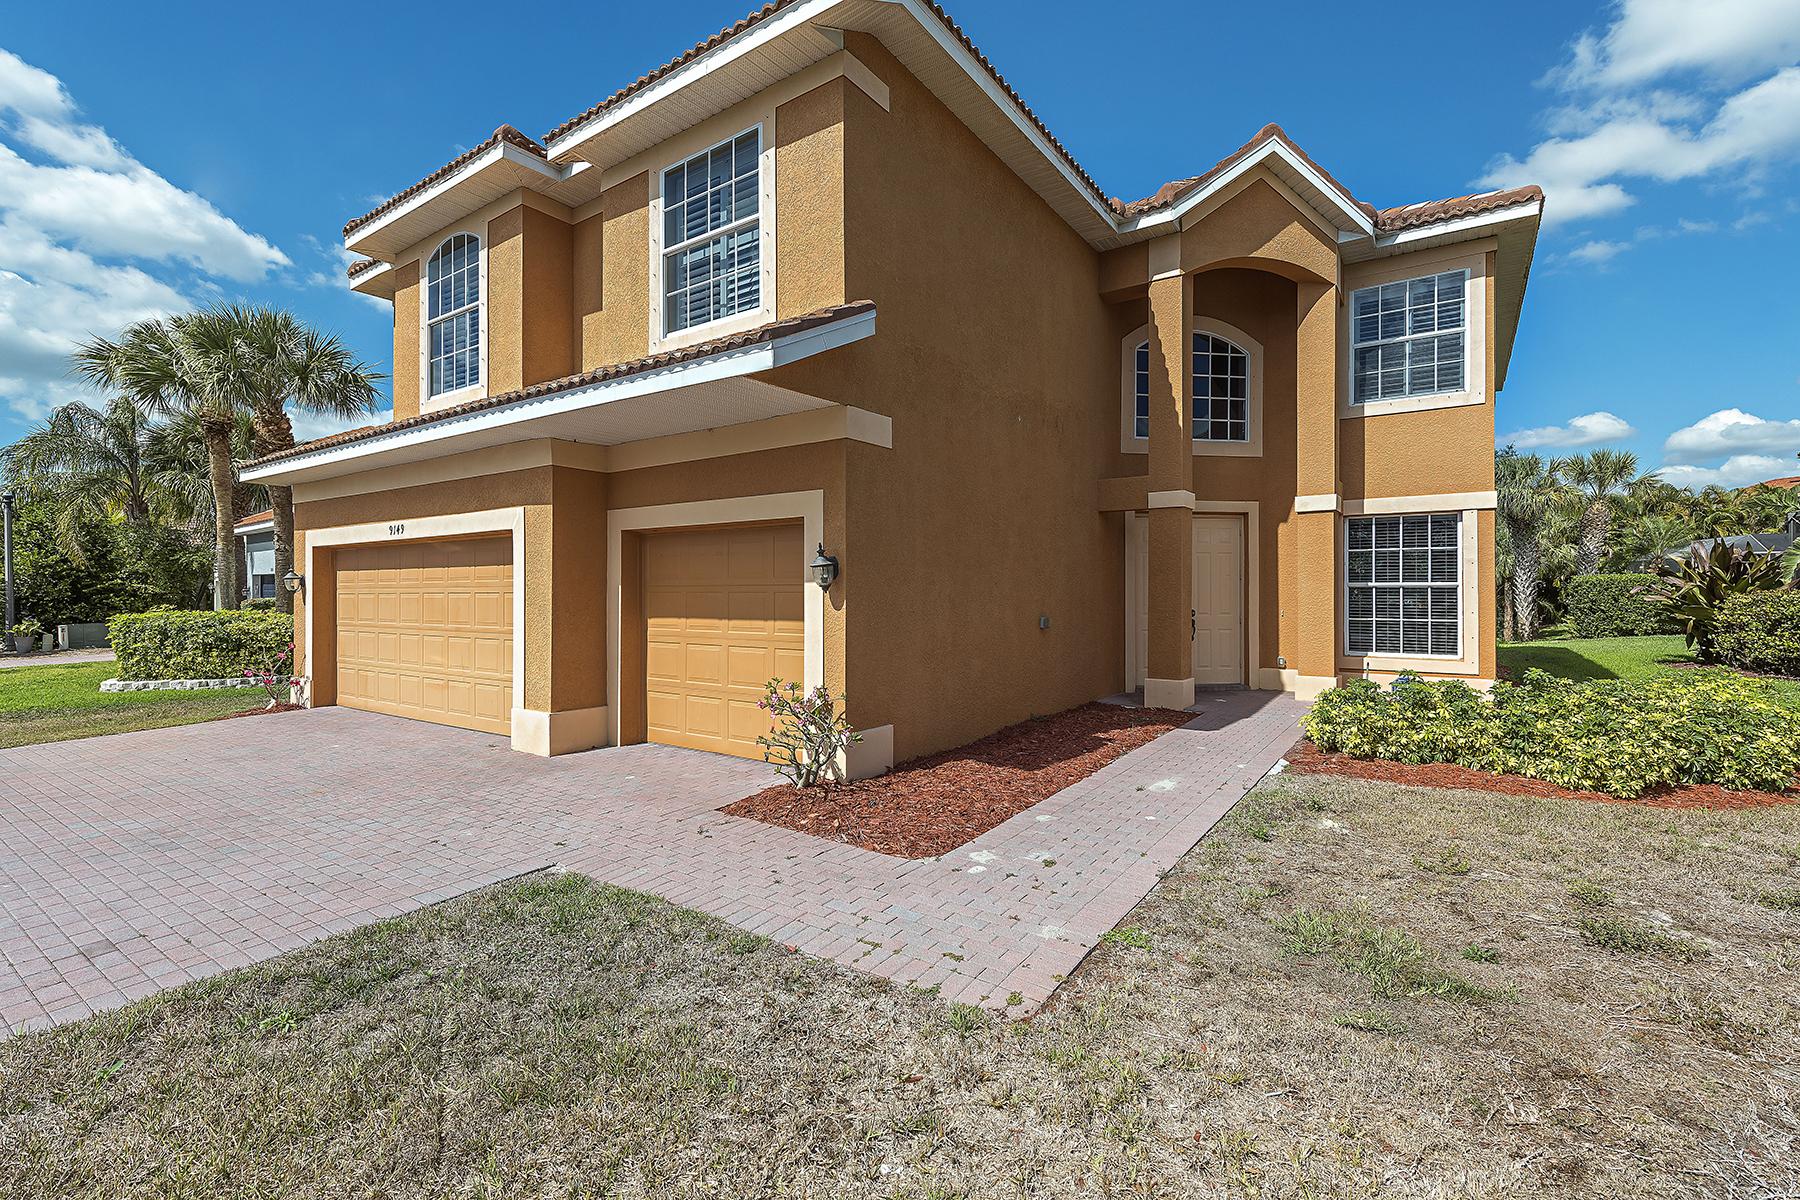 Single Family Home for Sale at 9149 Estero River Cir , Estero, FL 33928 9149 Estero River Cir, Estero, Florida, 33928 United States